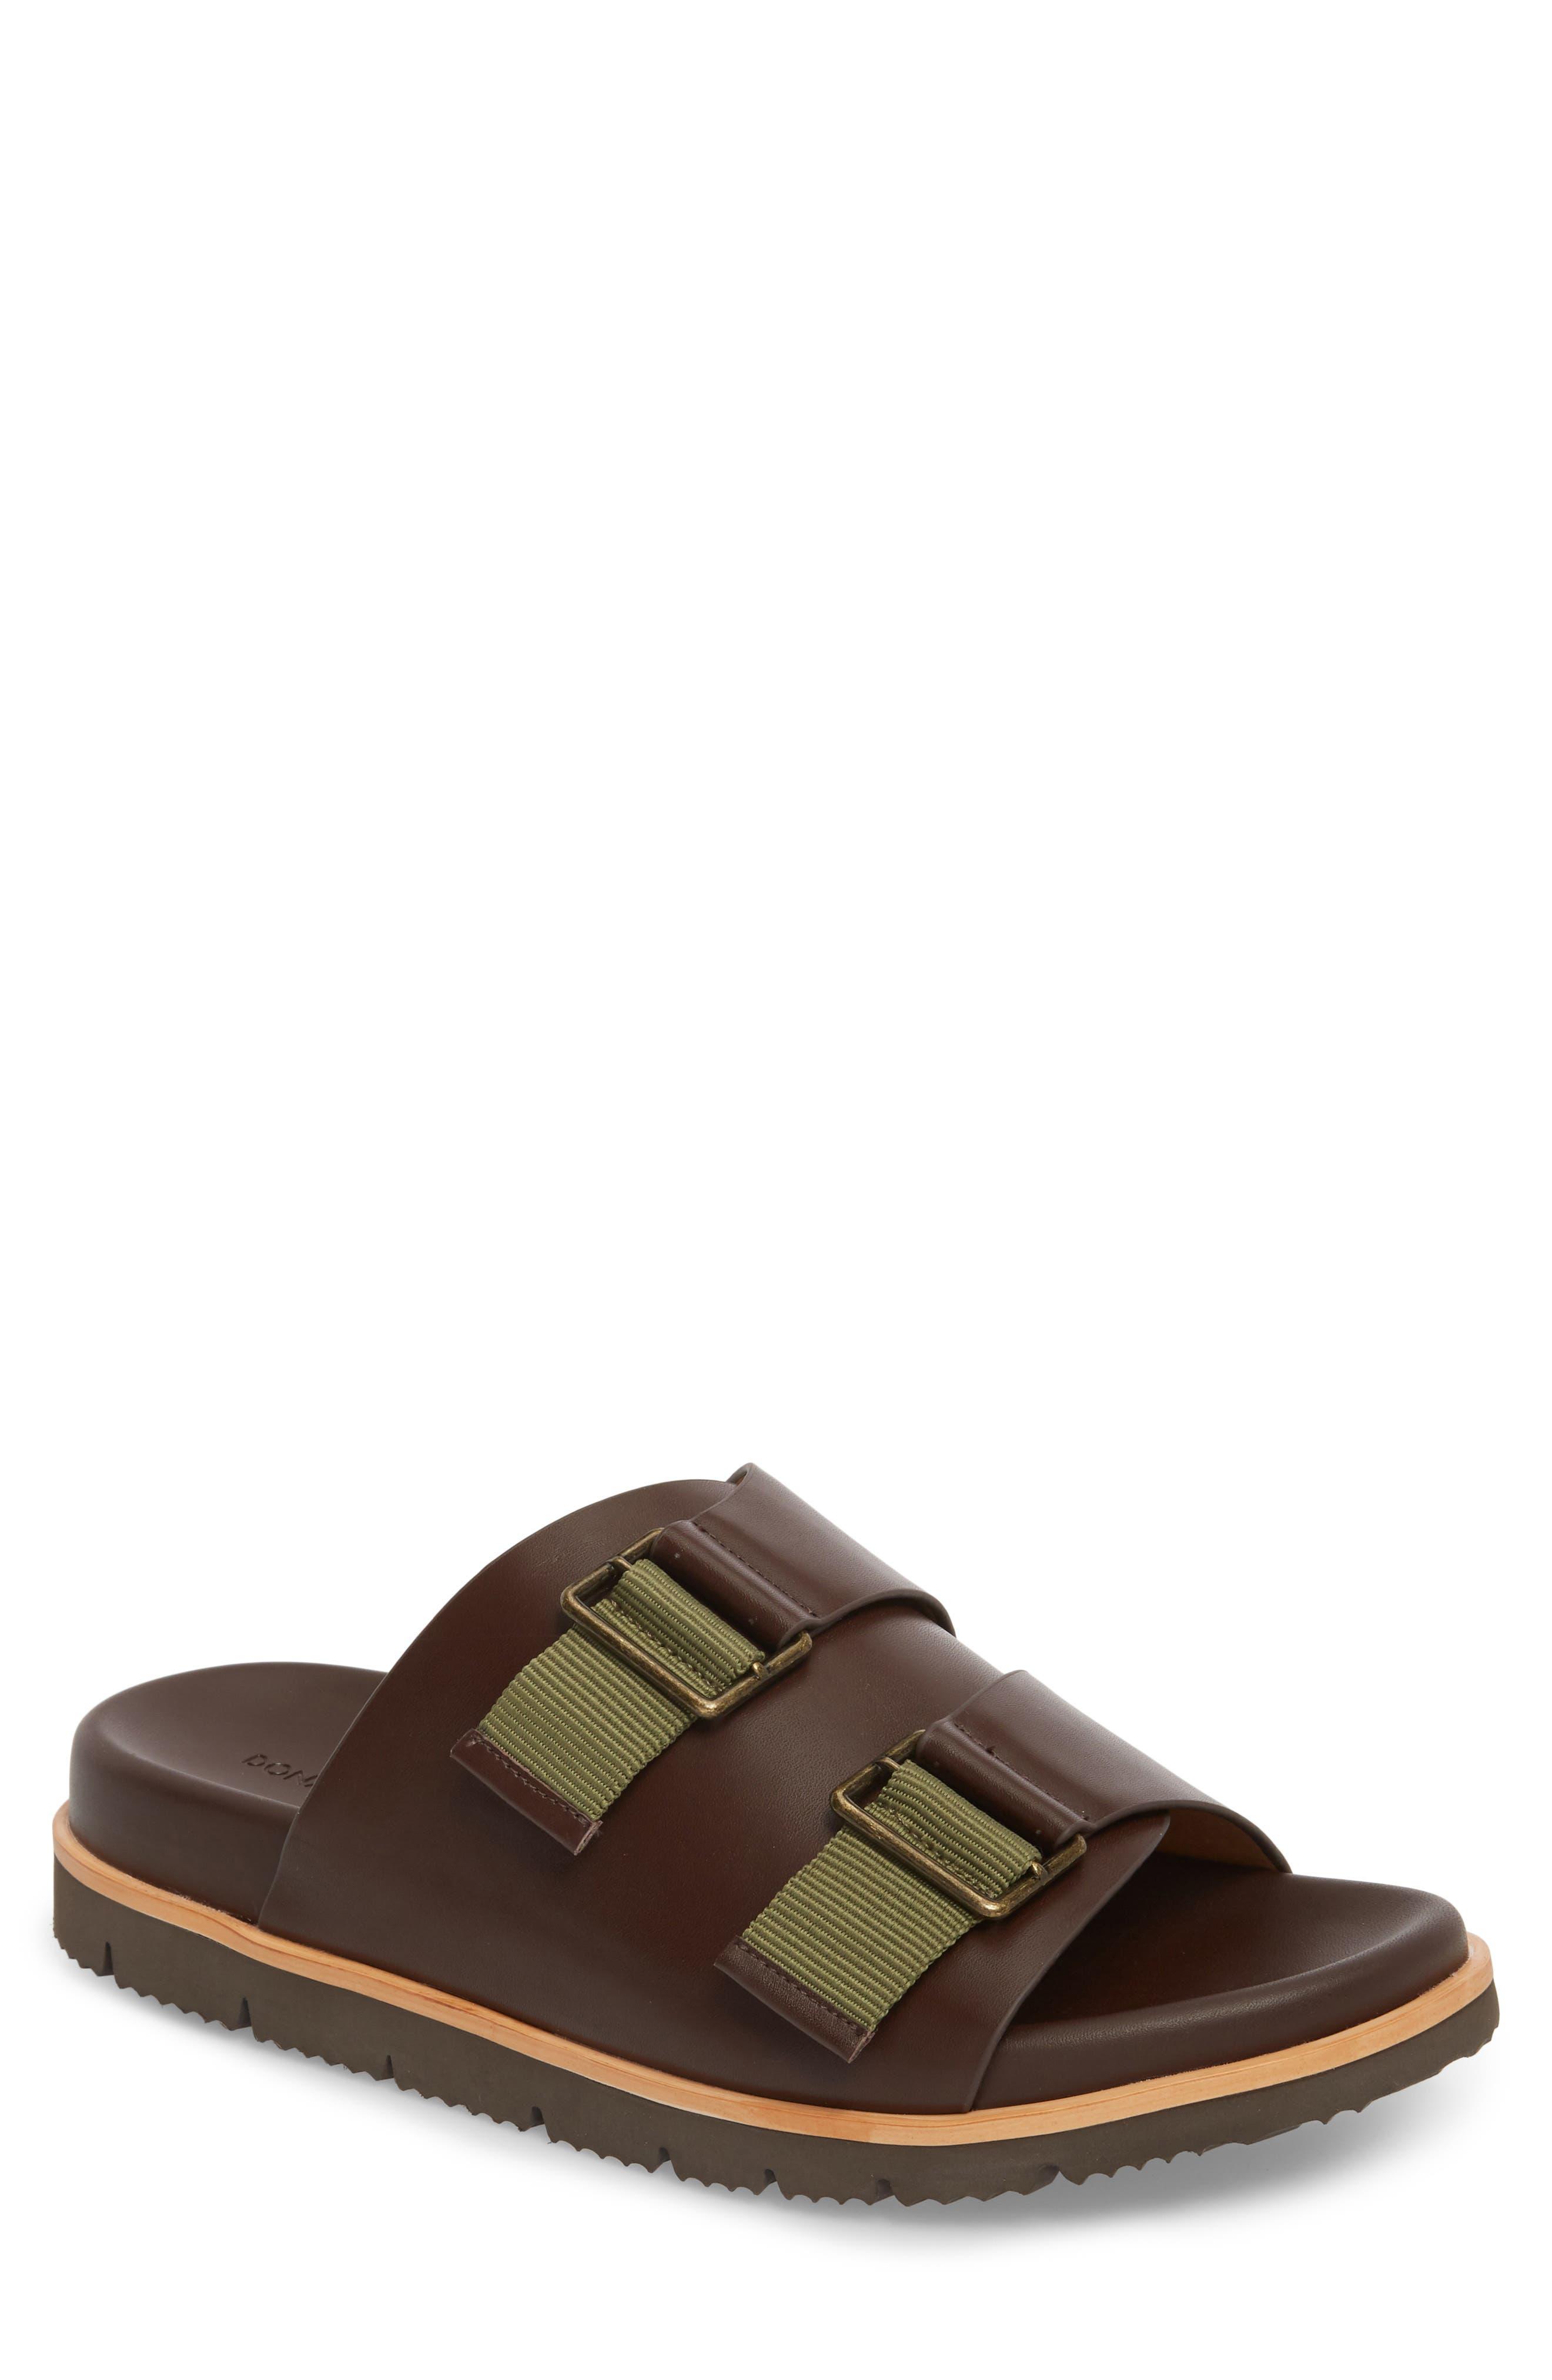 Slide Sandal,                             Main thumbnail 1, color,                             Expresso/ Tan Leather